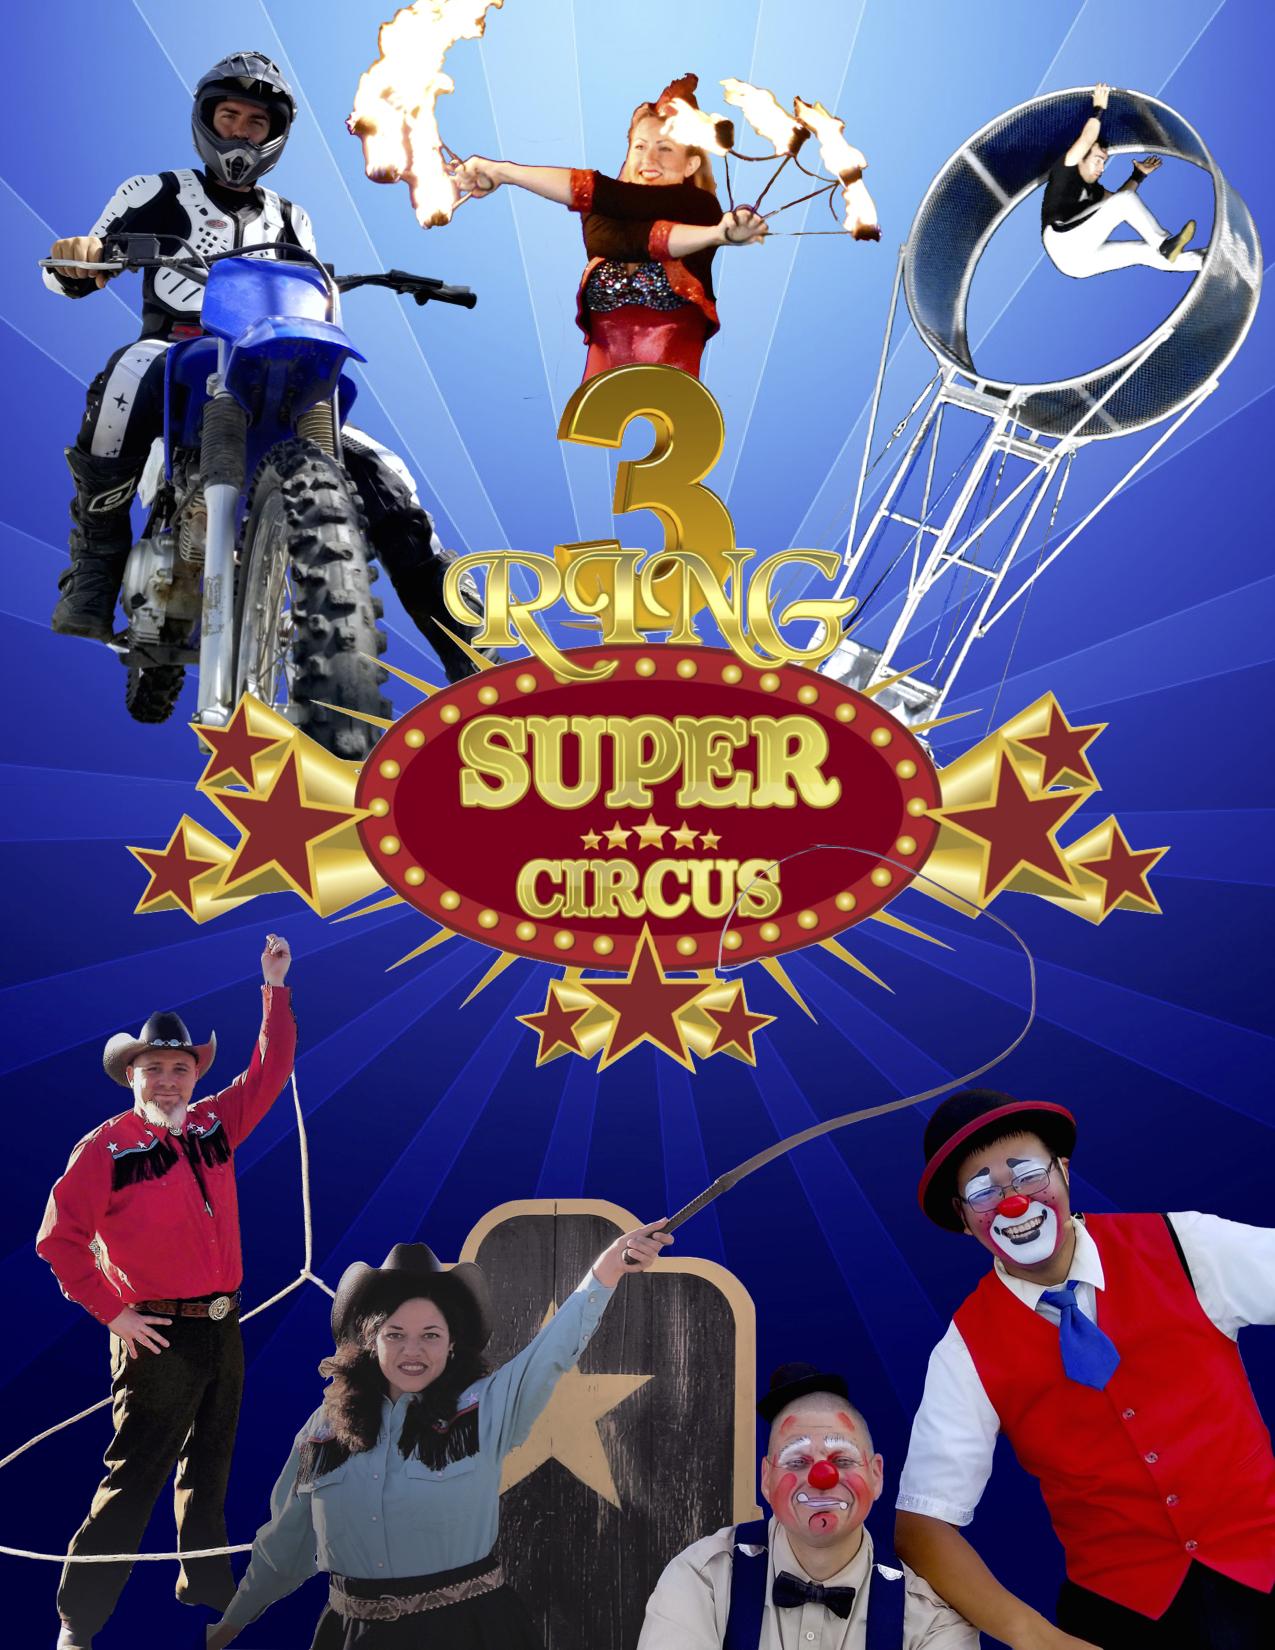 3 Ring Super Circus Poster